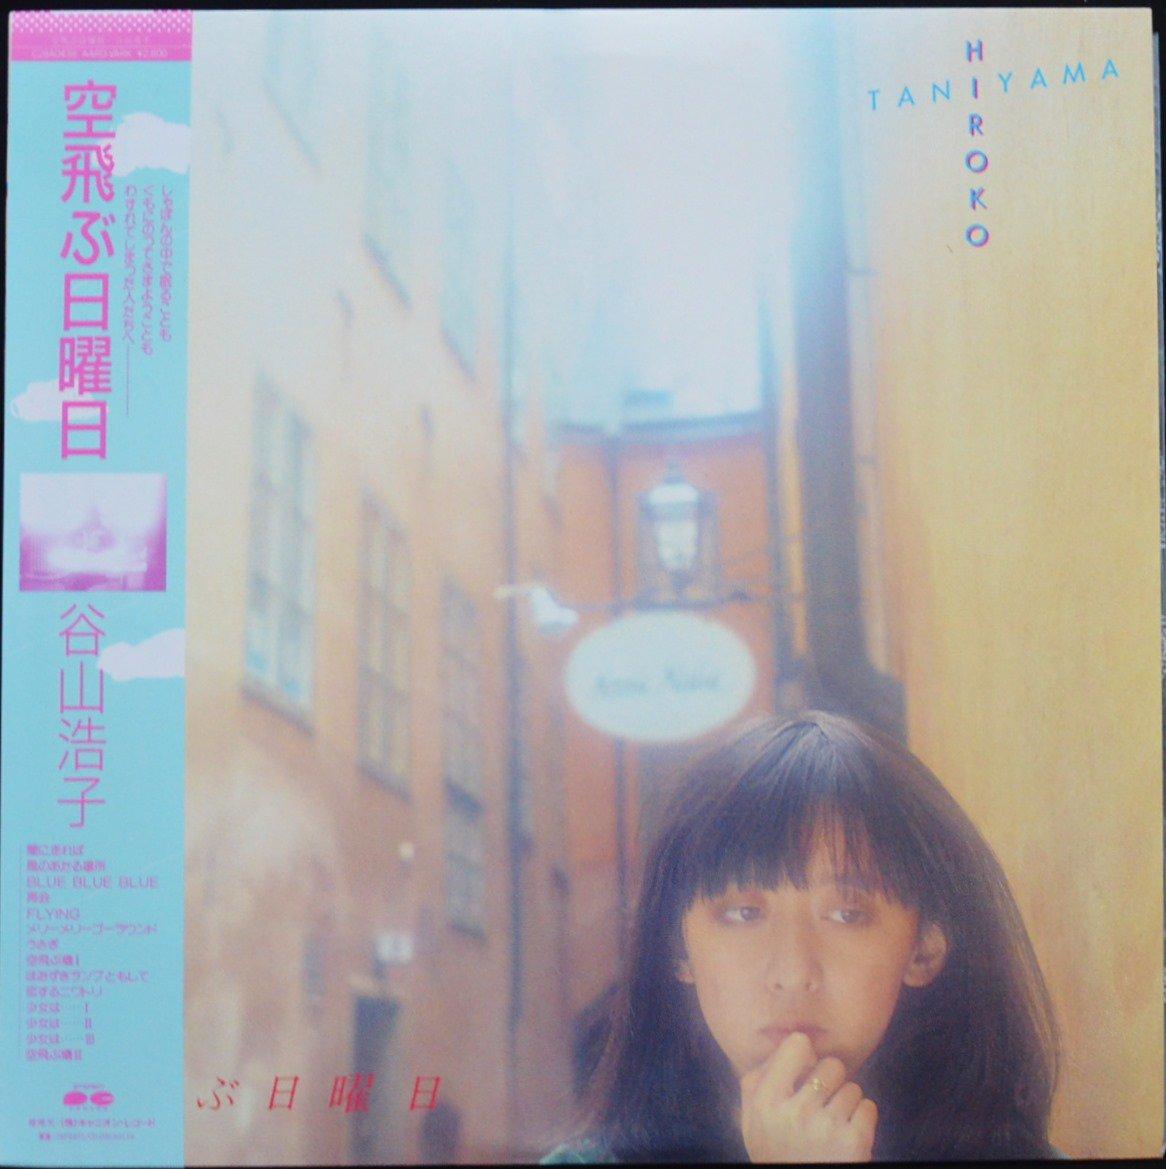 谷山浩子 HIROKO TANIYAMA / 空飛ぶ日曜日 (LP)